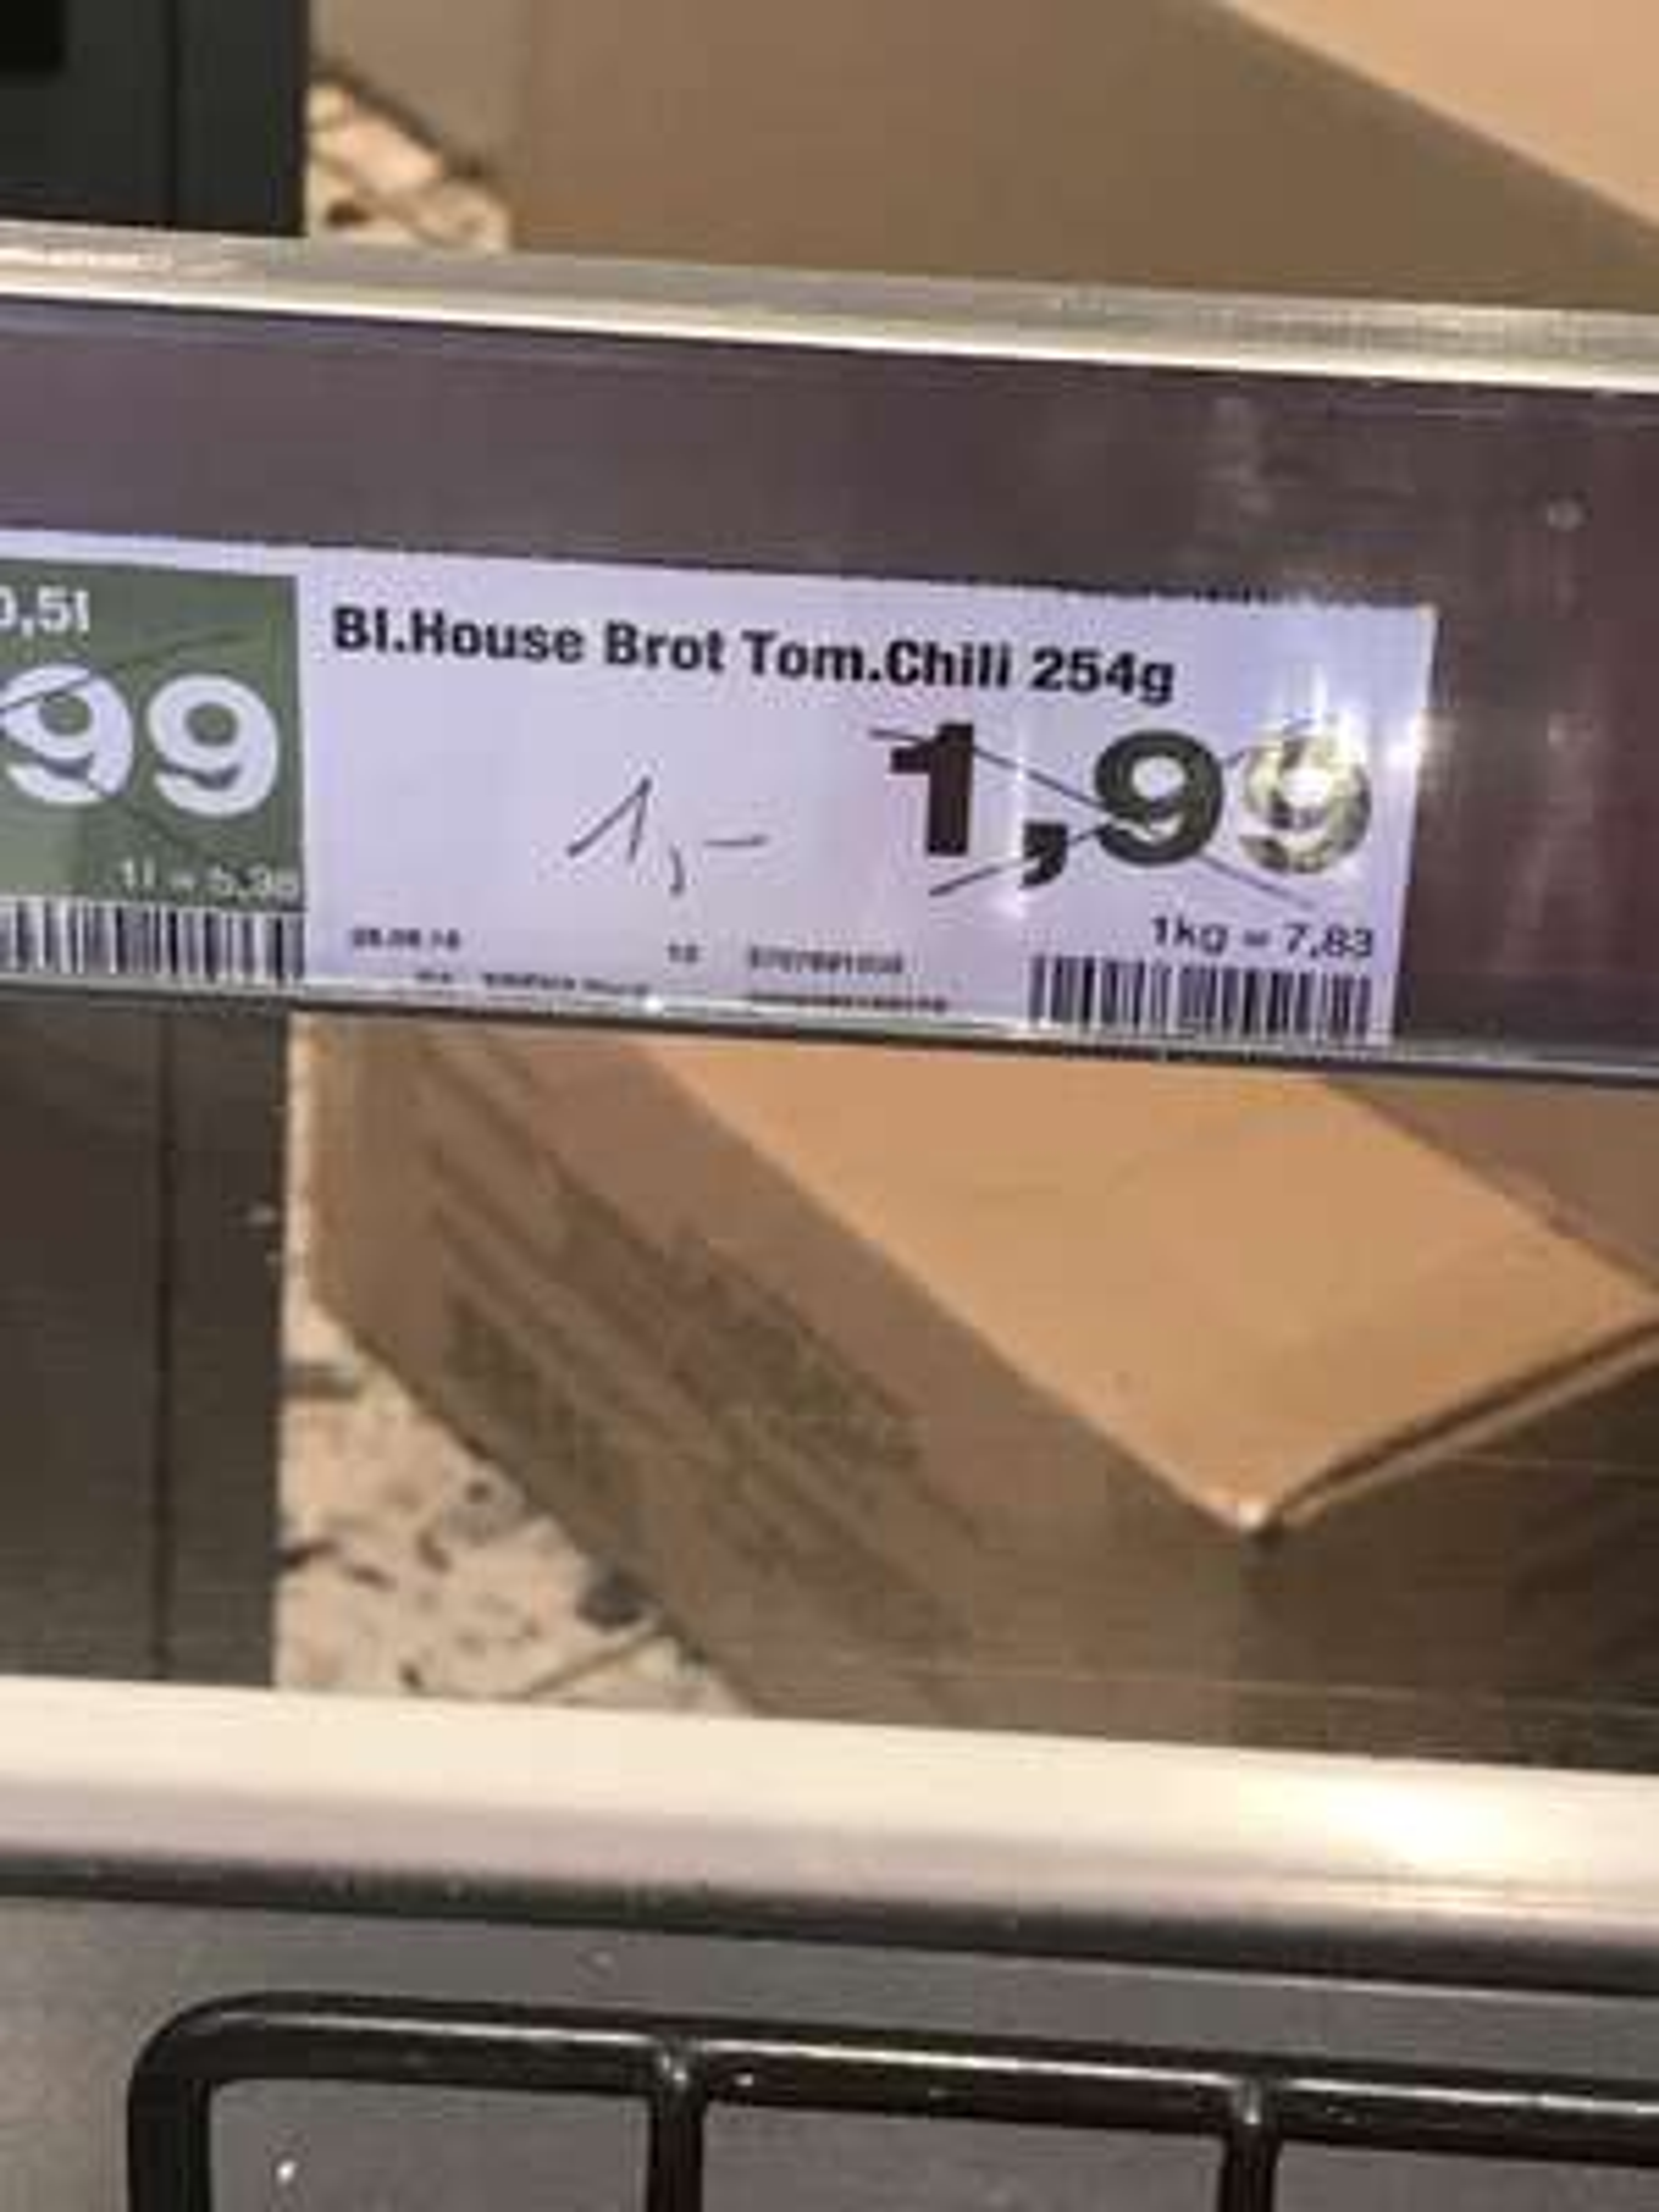 Blockhaus Brot   Tom. Chili Bei Edeka Direkt U Bahn Hamburg  Langenhorn